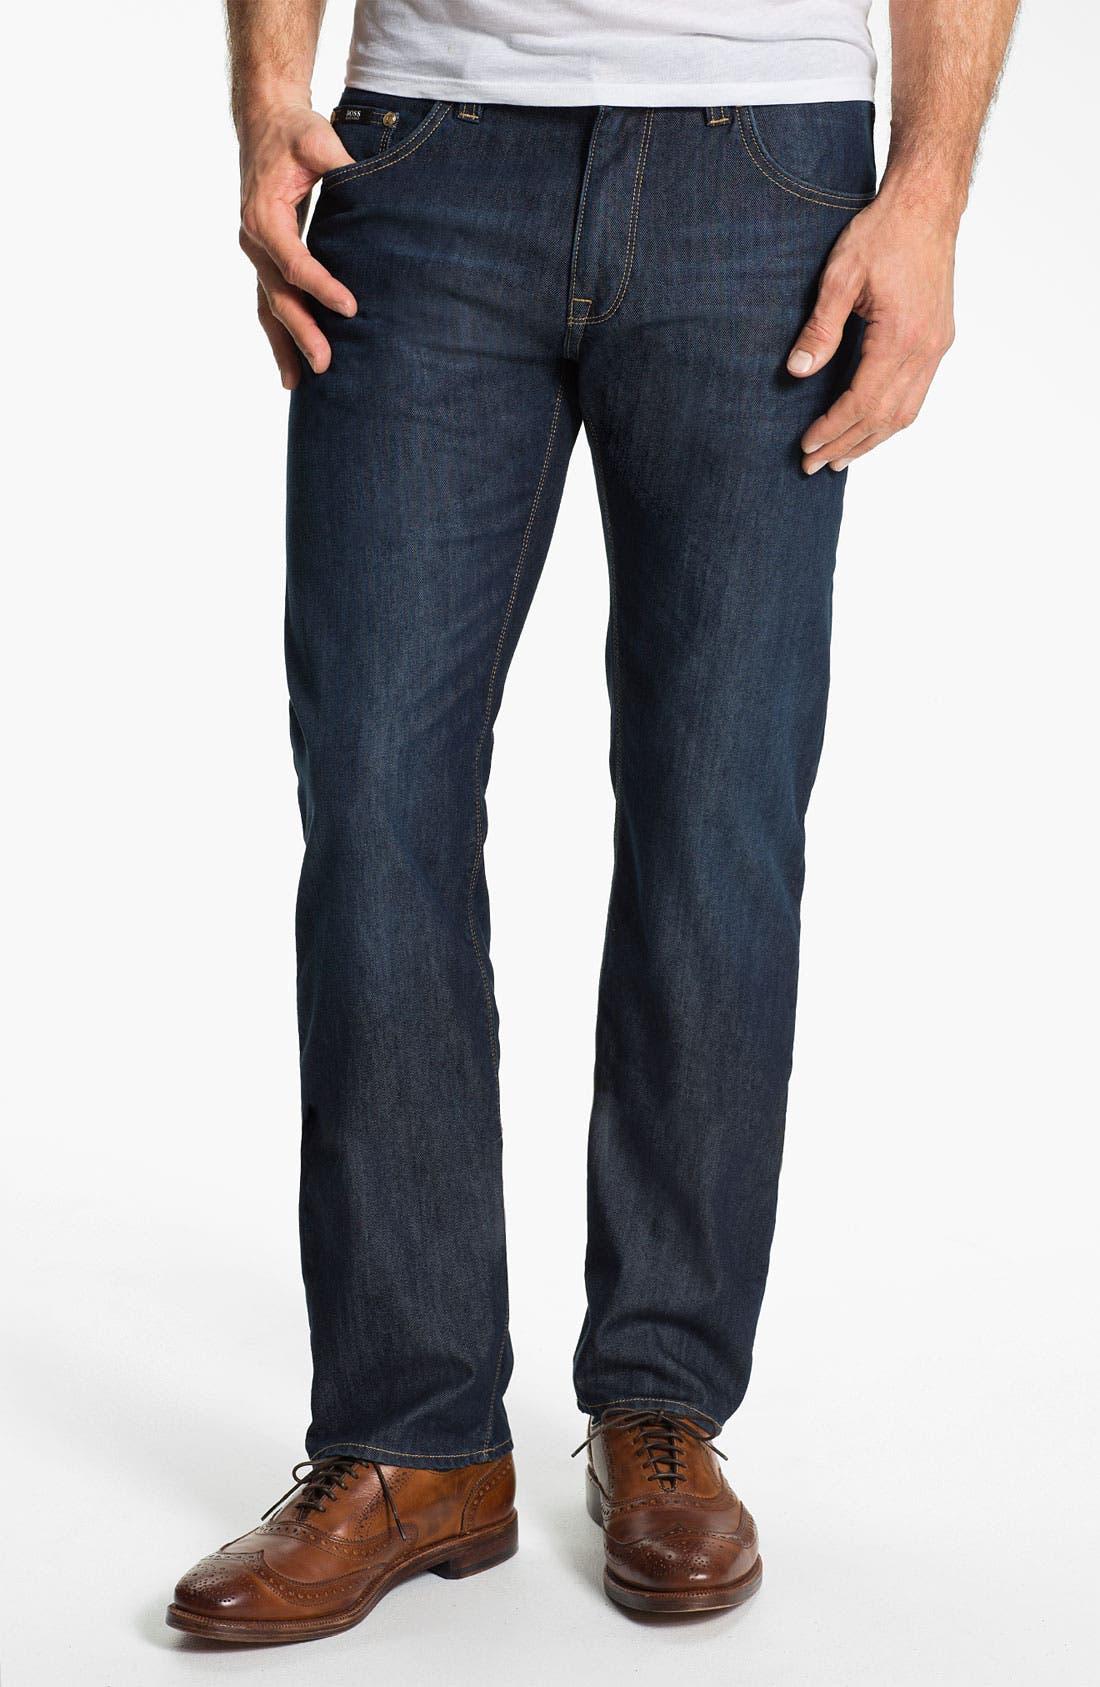 Alternate Image 1 Selected - BOSS Black 'Maine' Straight Leg Jeans (Blue Flannel)